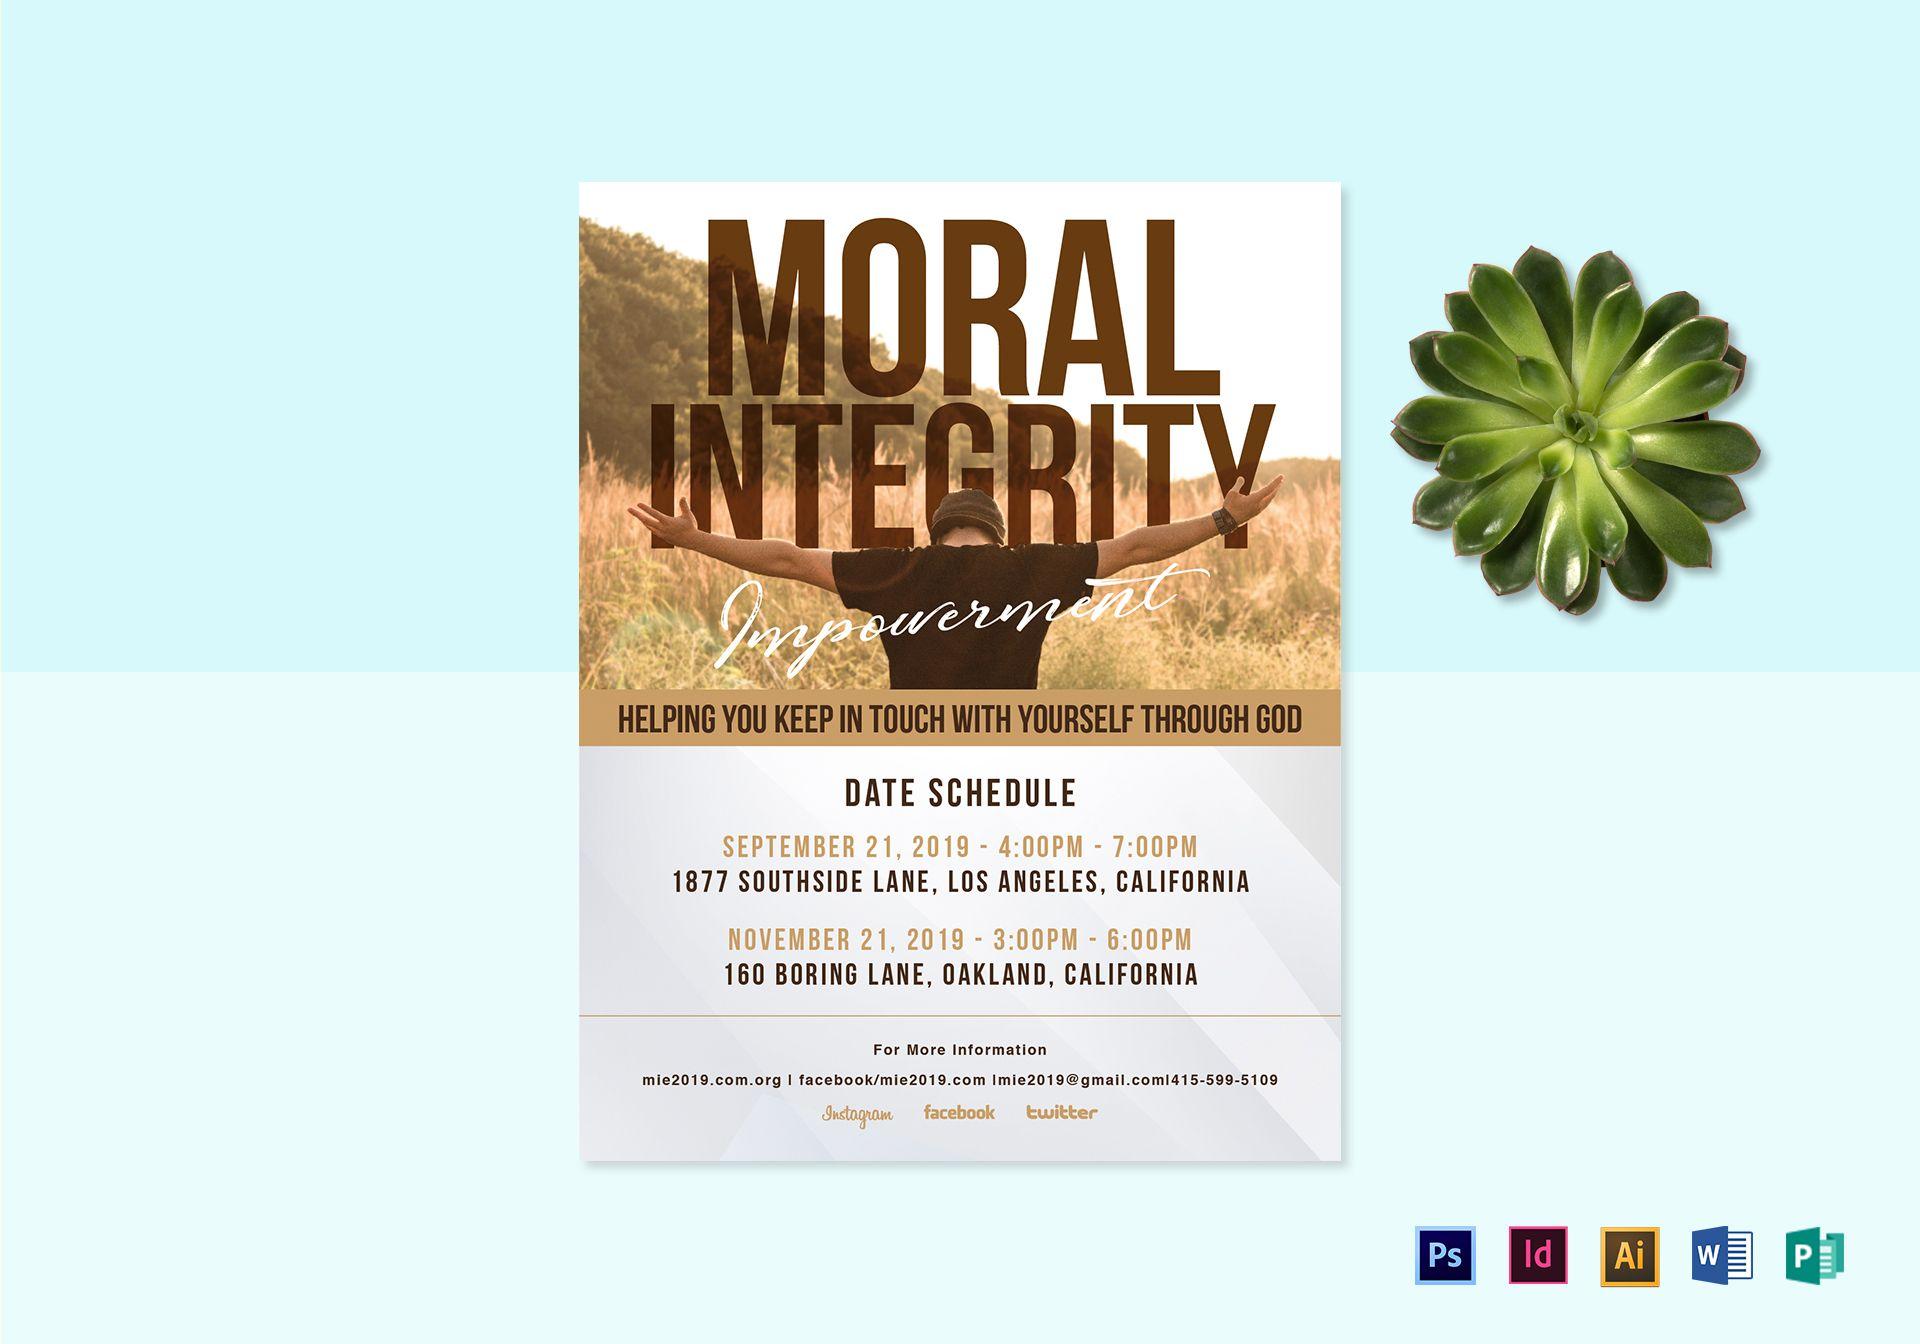 Moral Integrity Flyer